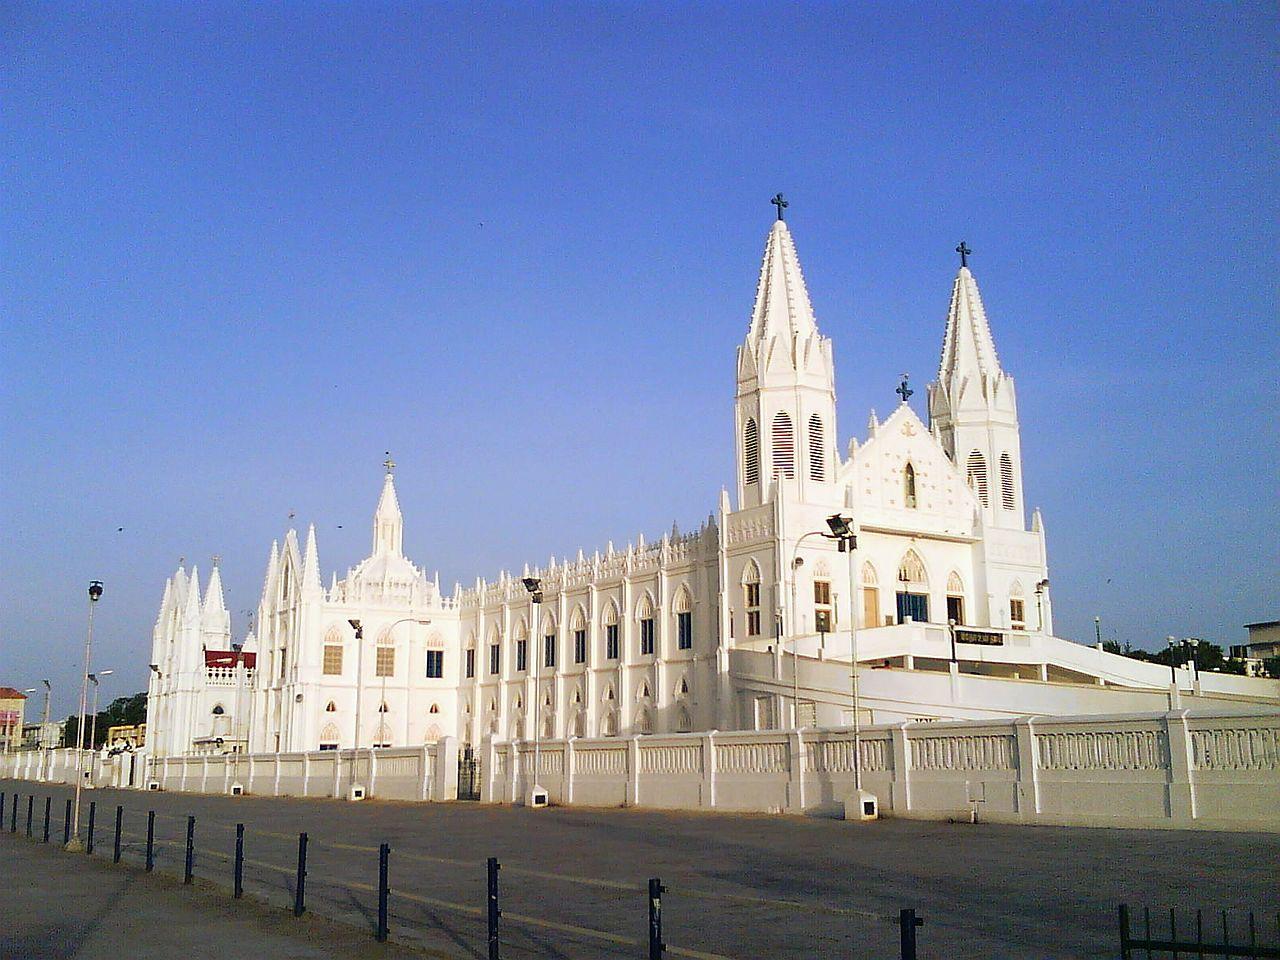 File:Velankanni church,nagapattinam,tamilnadu - panoramio ...